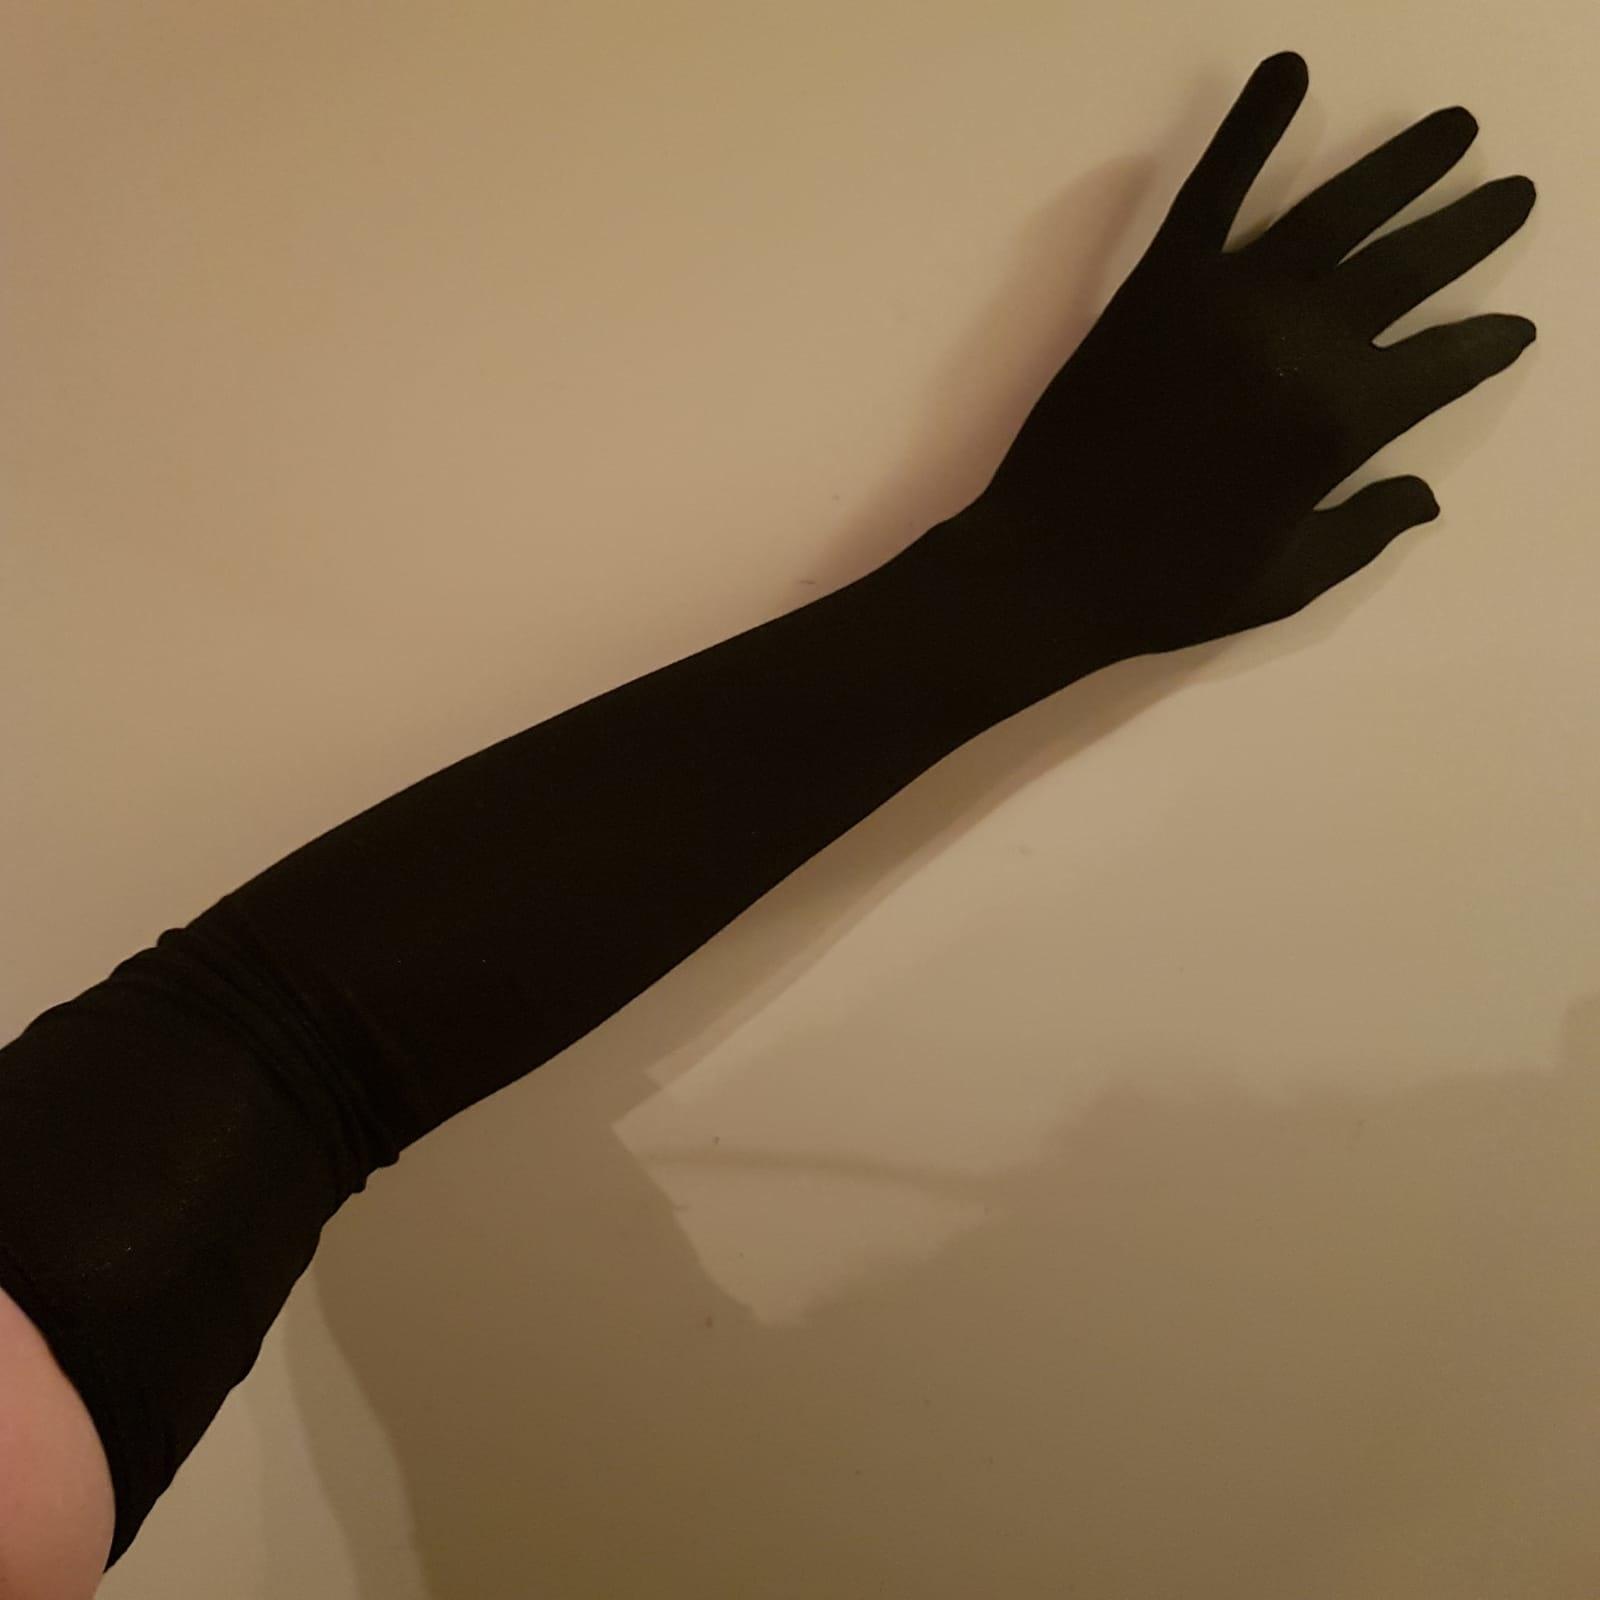 Katoenen opera lengte handschoenen versch. kleuren